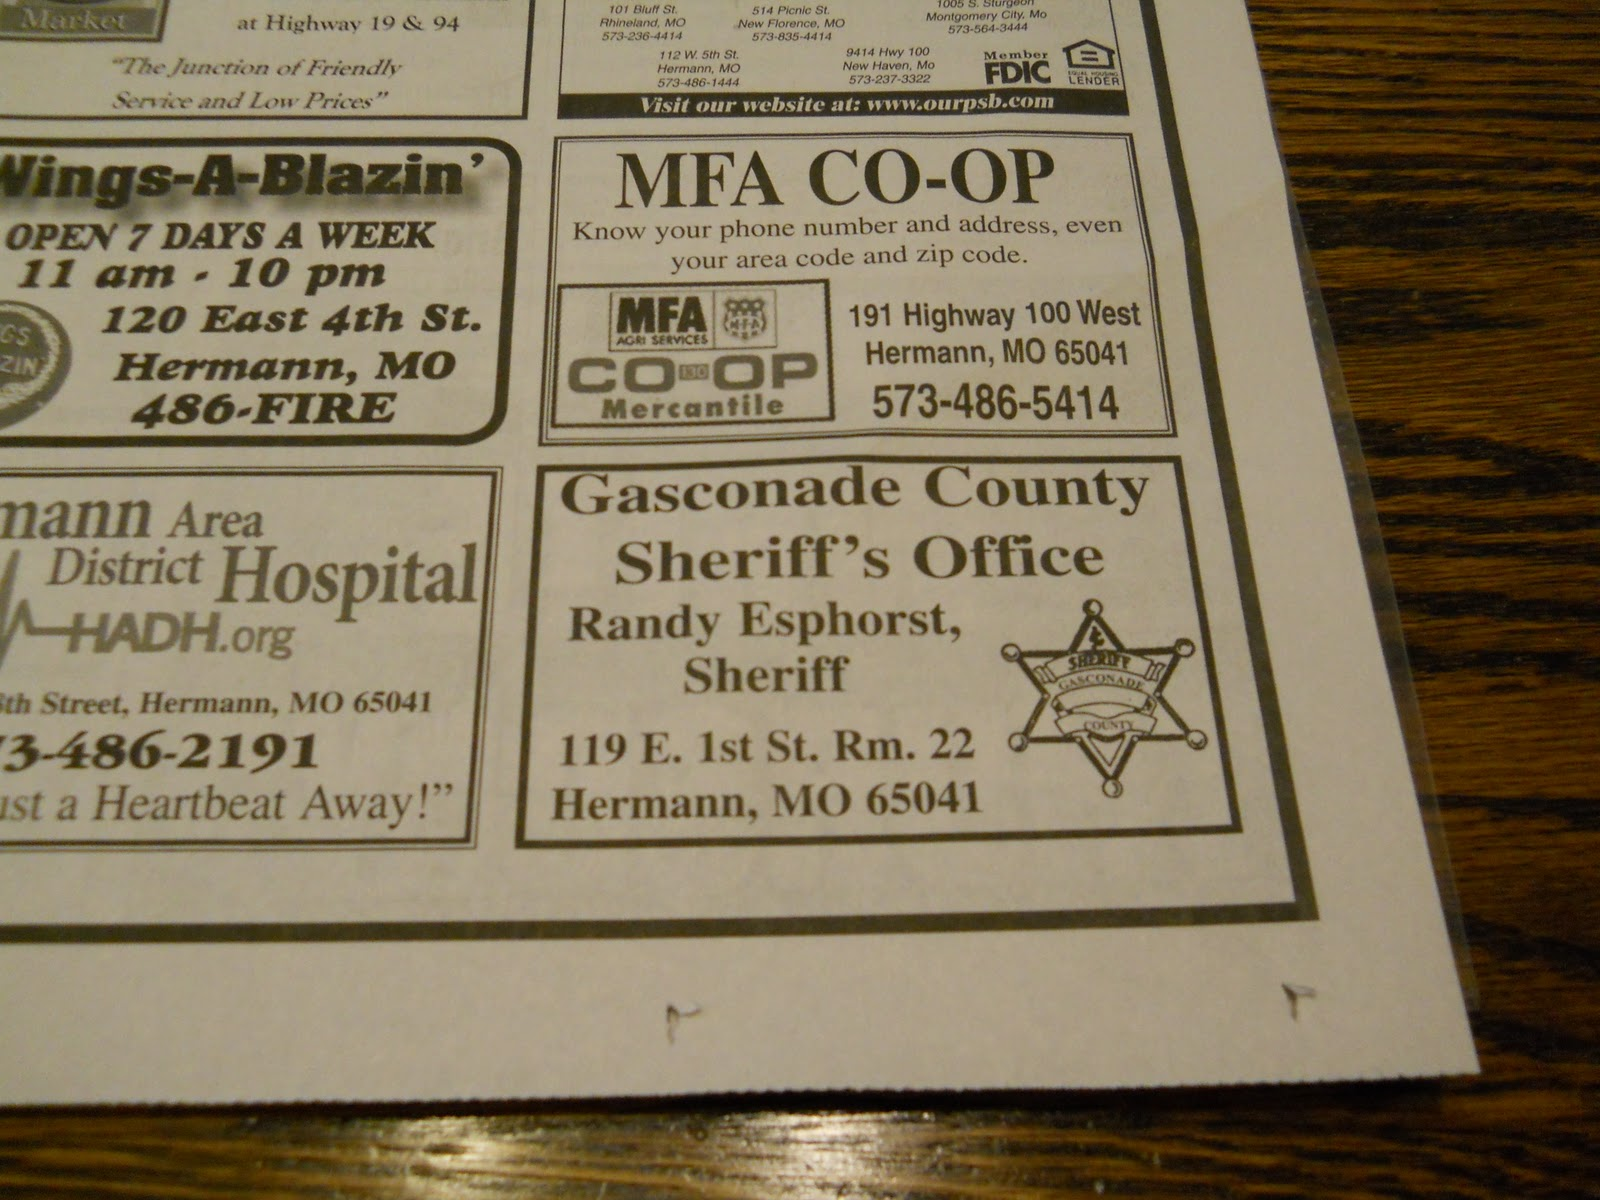 http://4.bp.blogspot.com/_LlFPqn-78D4/TMsyr1bQIxI/AAAAAAAACGo/vCXWkD6T4s0/s1600/Sheriff%27s+Ad+10.21.2010+002.jpg